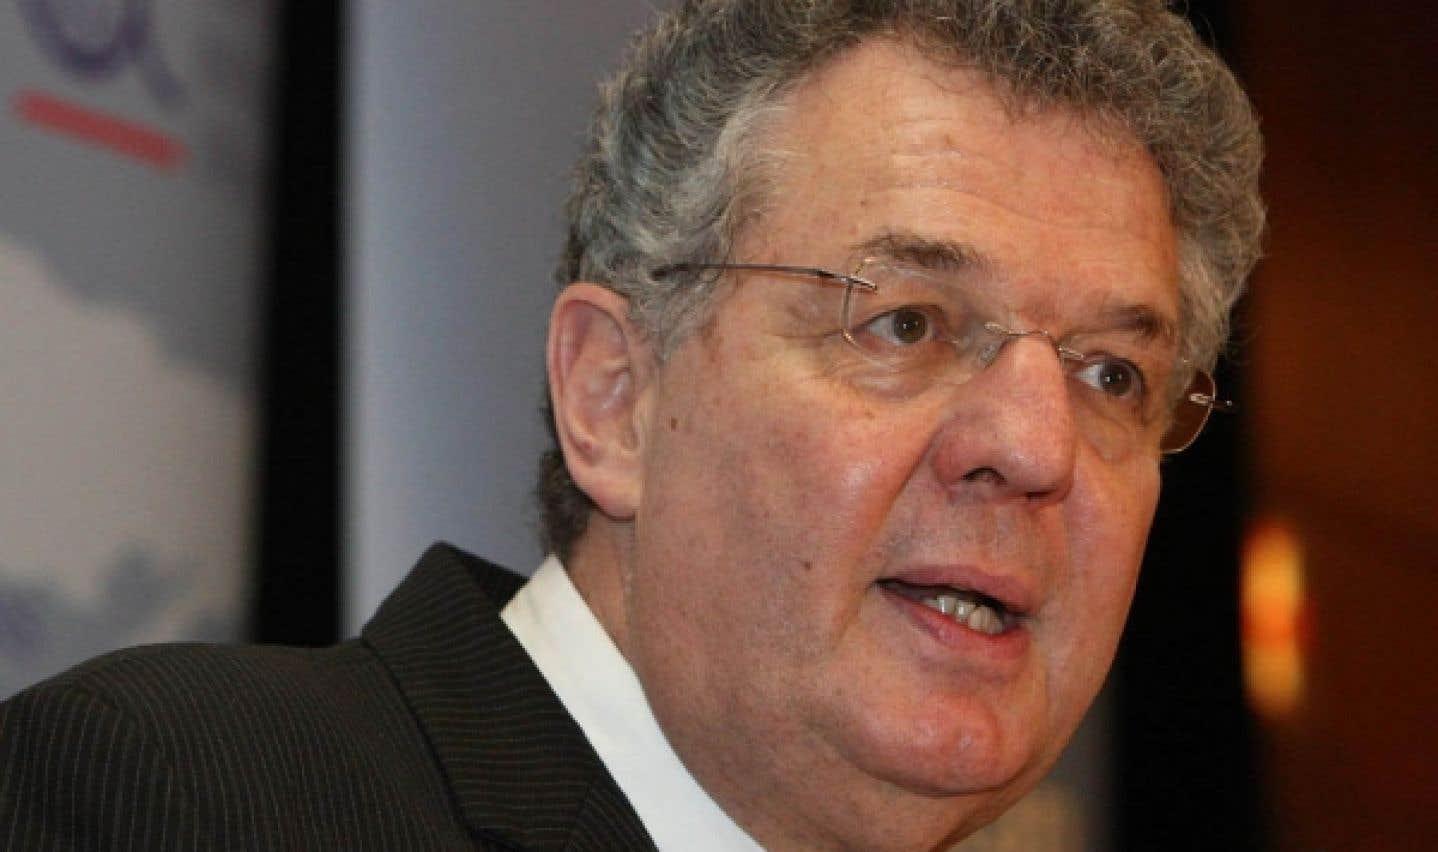 Bernard Cerquiglini, recteur de l'Agence universitaire de la Francophonie